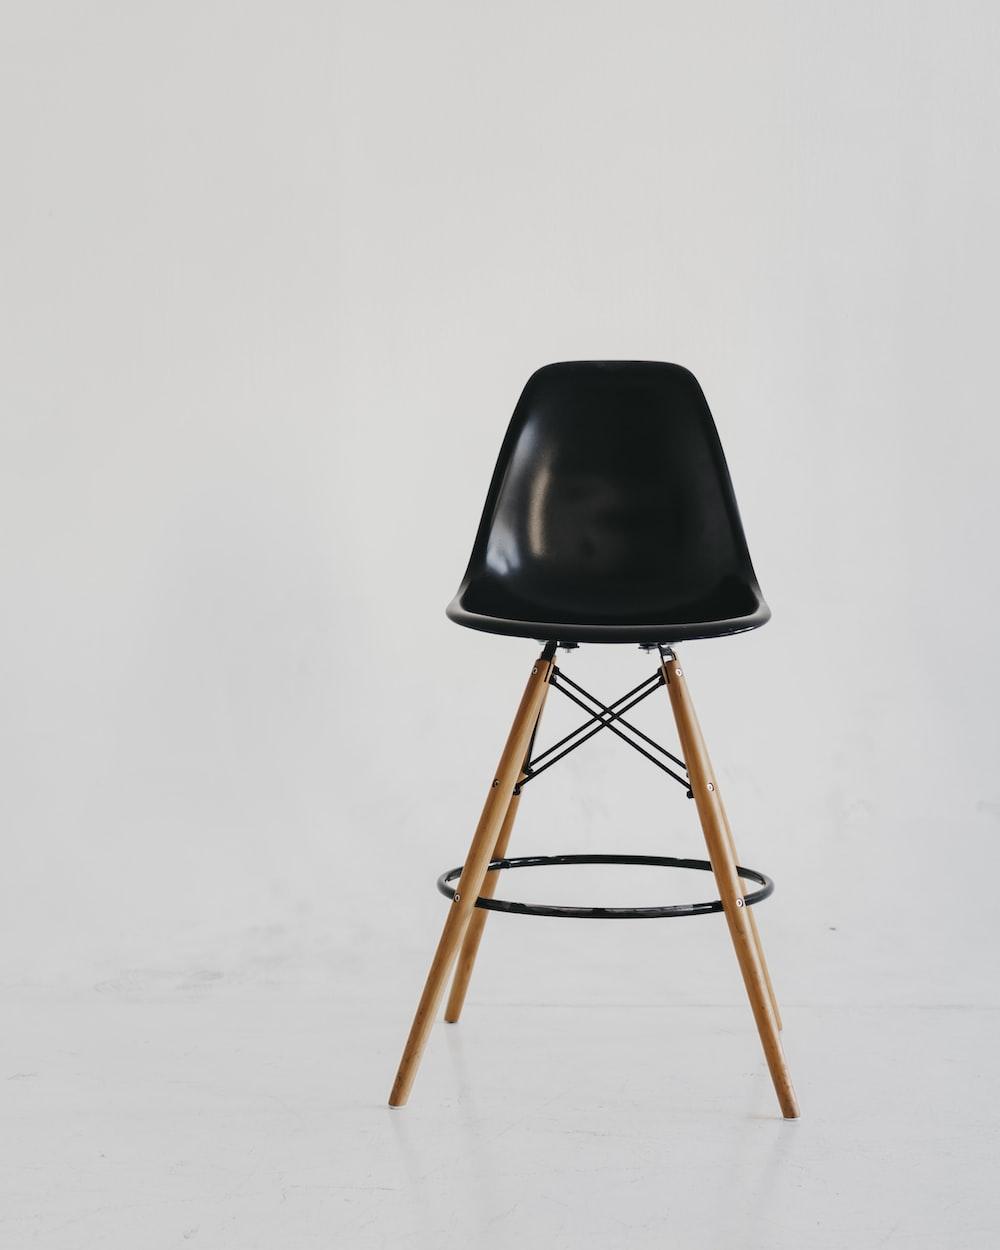 black chair on white snow